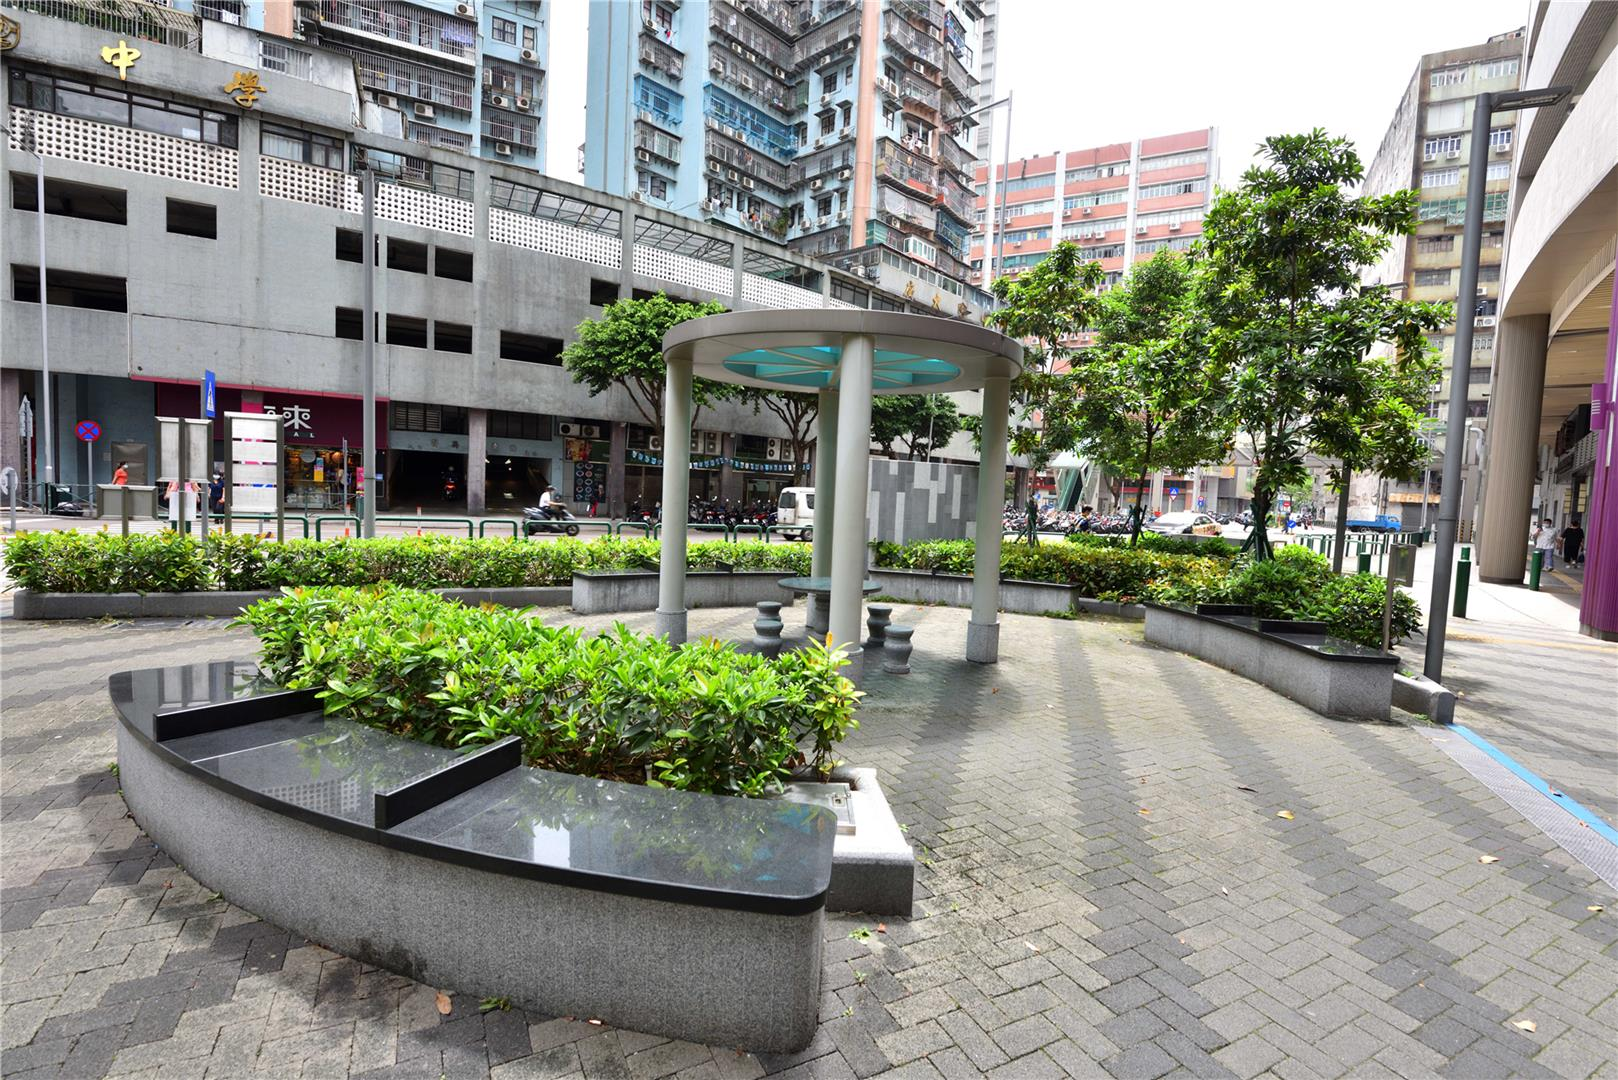 Leisure Area in Rua Nova do Patane